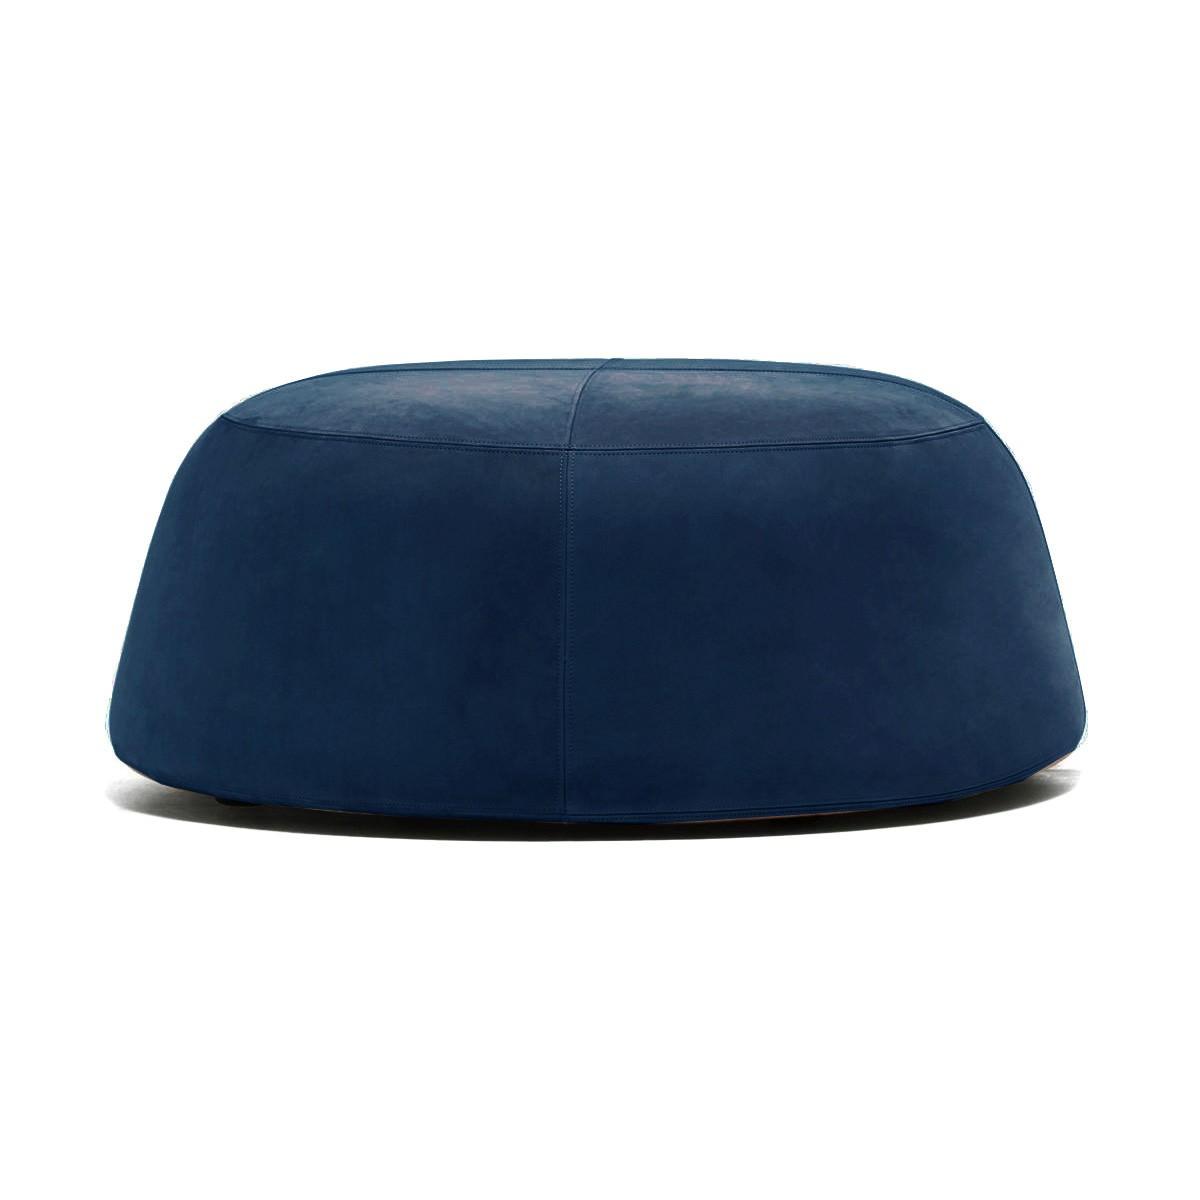 Pippa Velvet Fabric Round Ottoman, Large, Navy